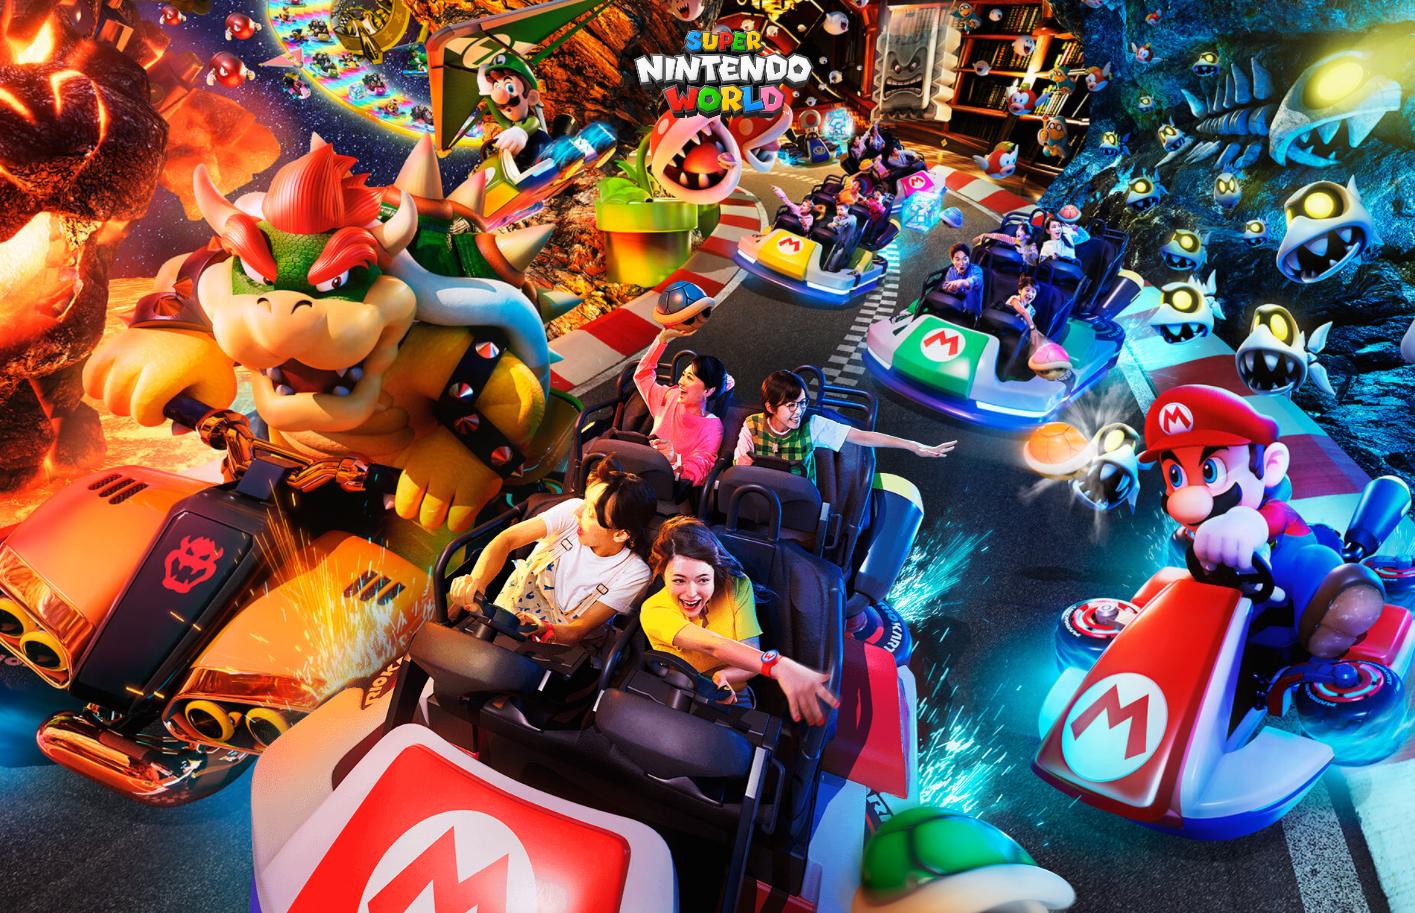 Mario Kart Super Nintendo World splash image